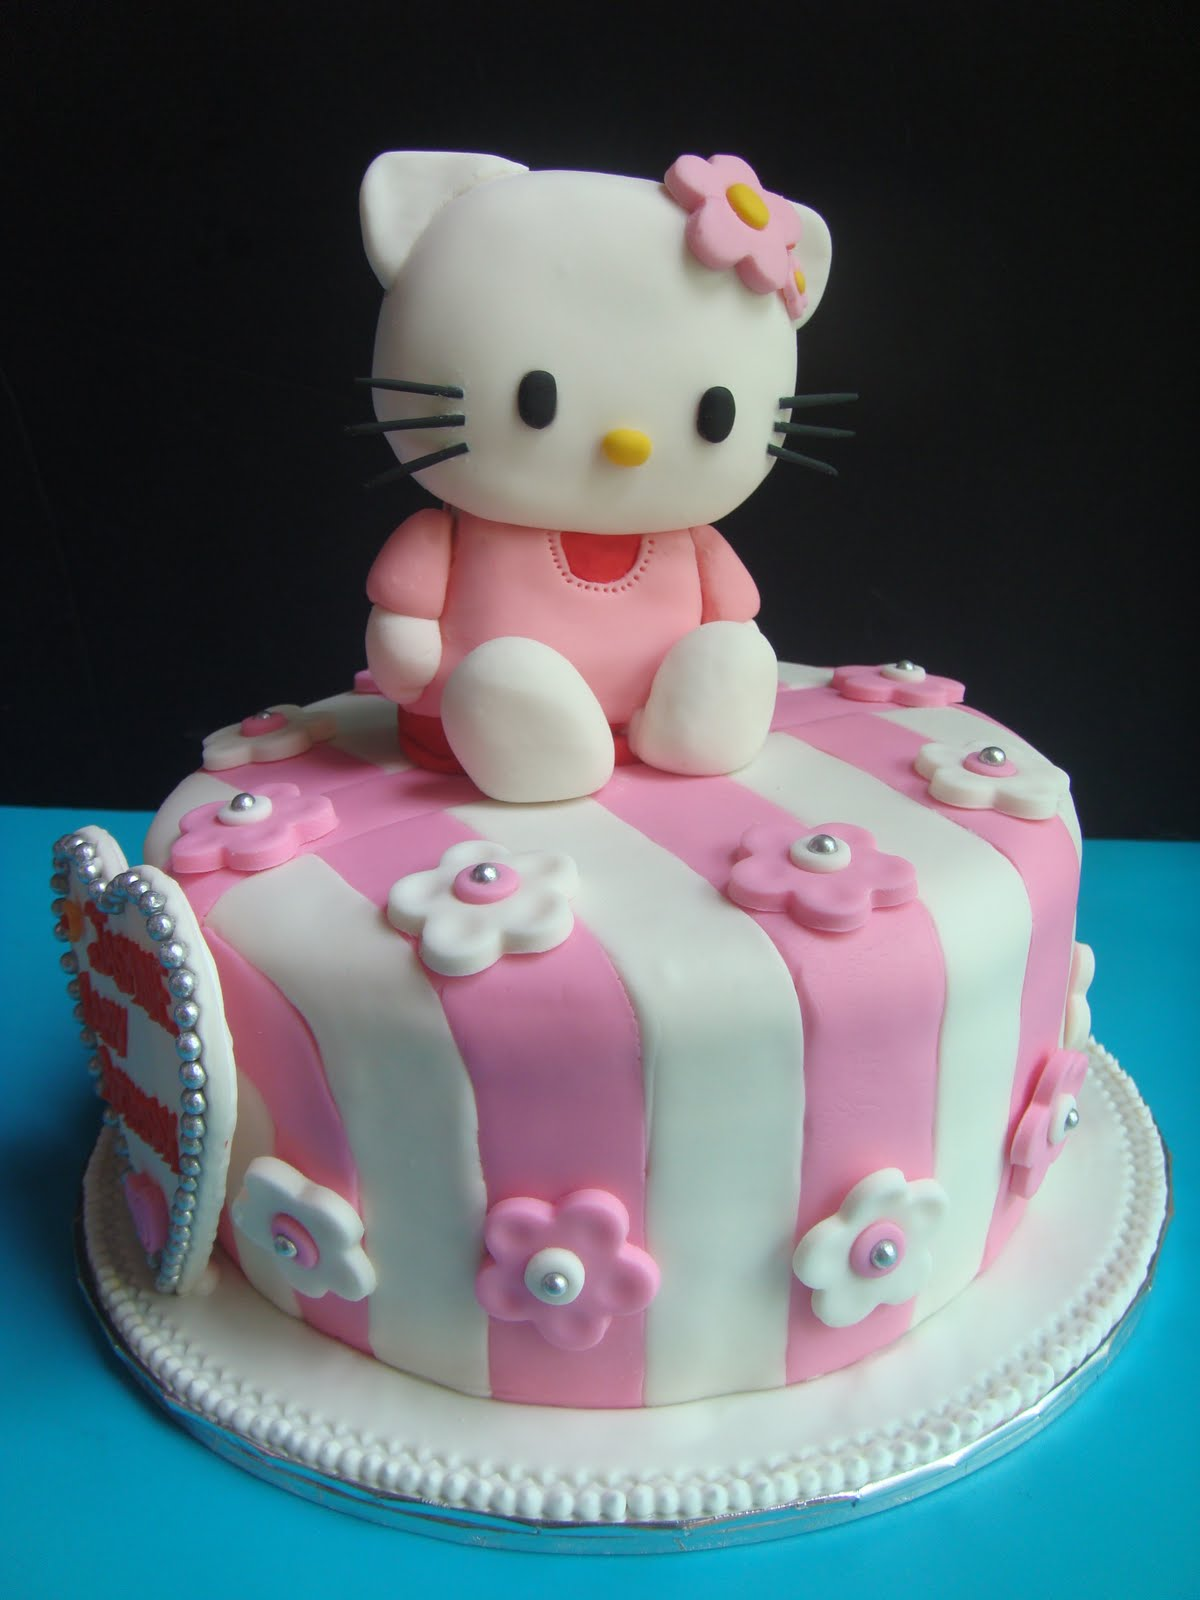 Yummy Baking Hello Kitty Fondant Cake D2